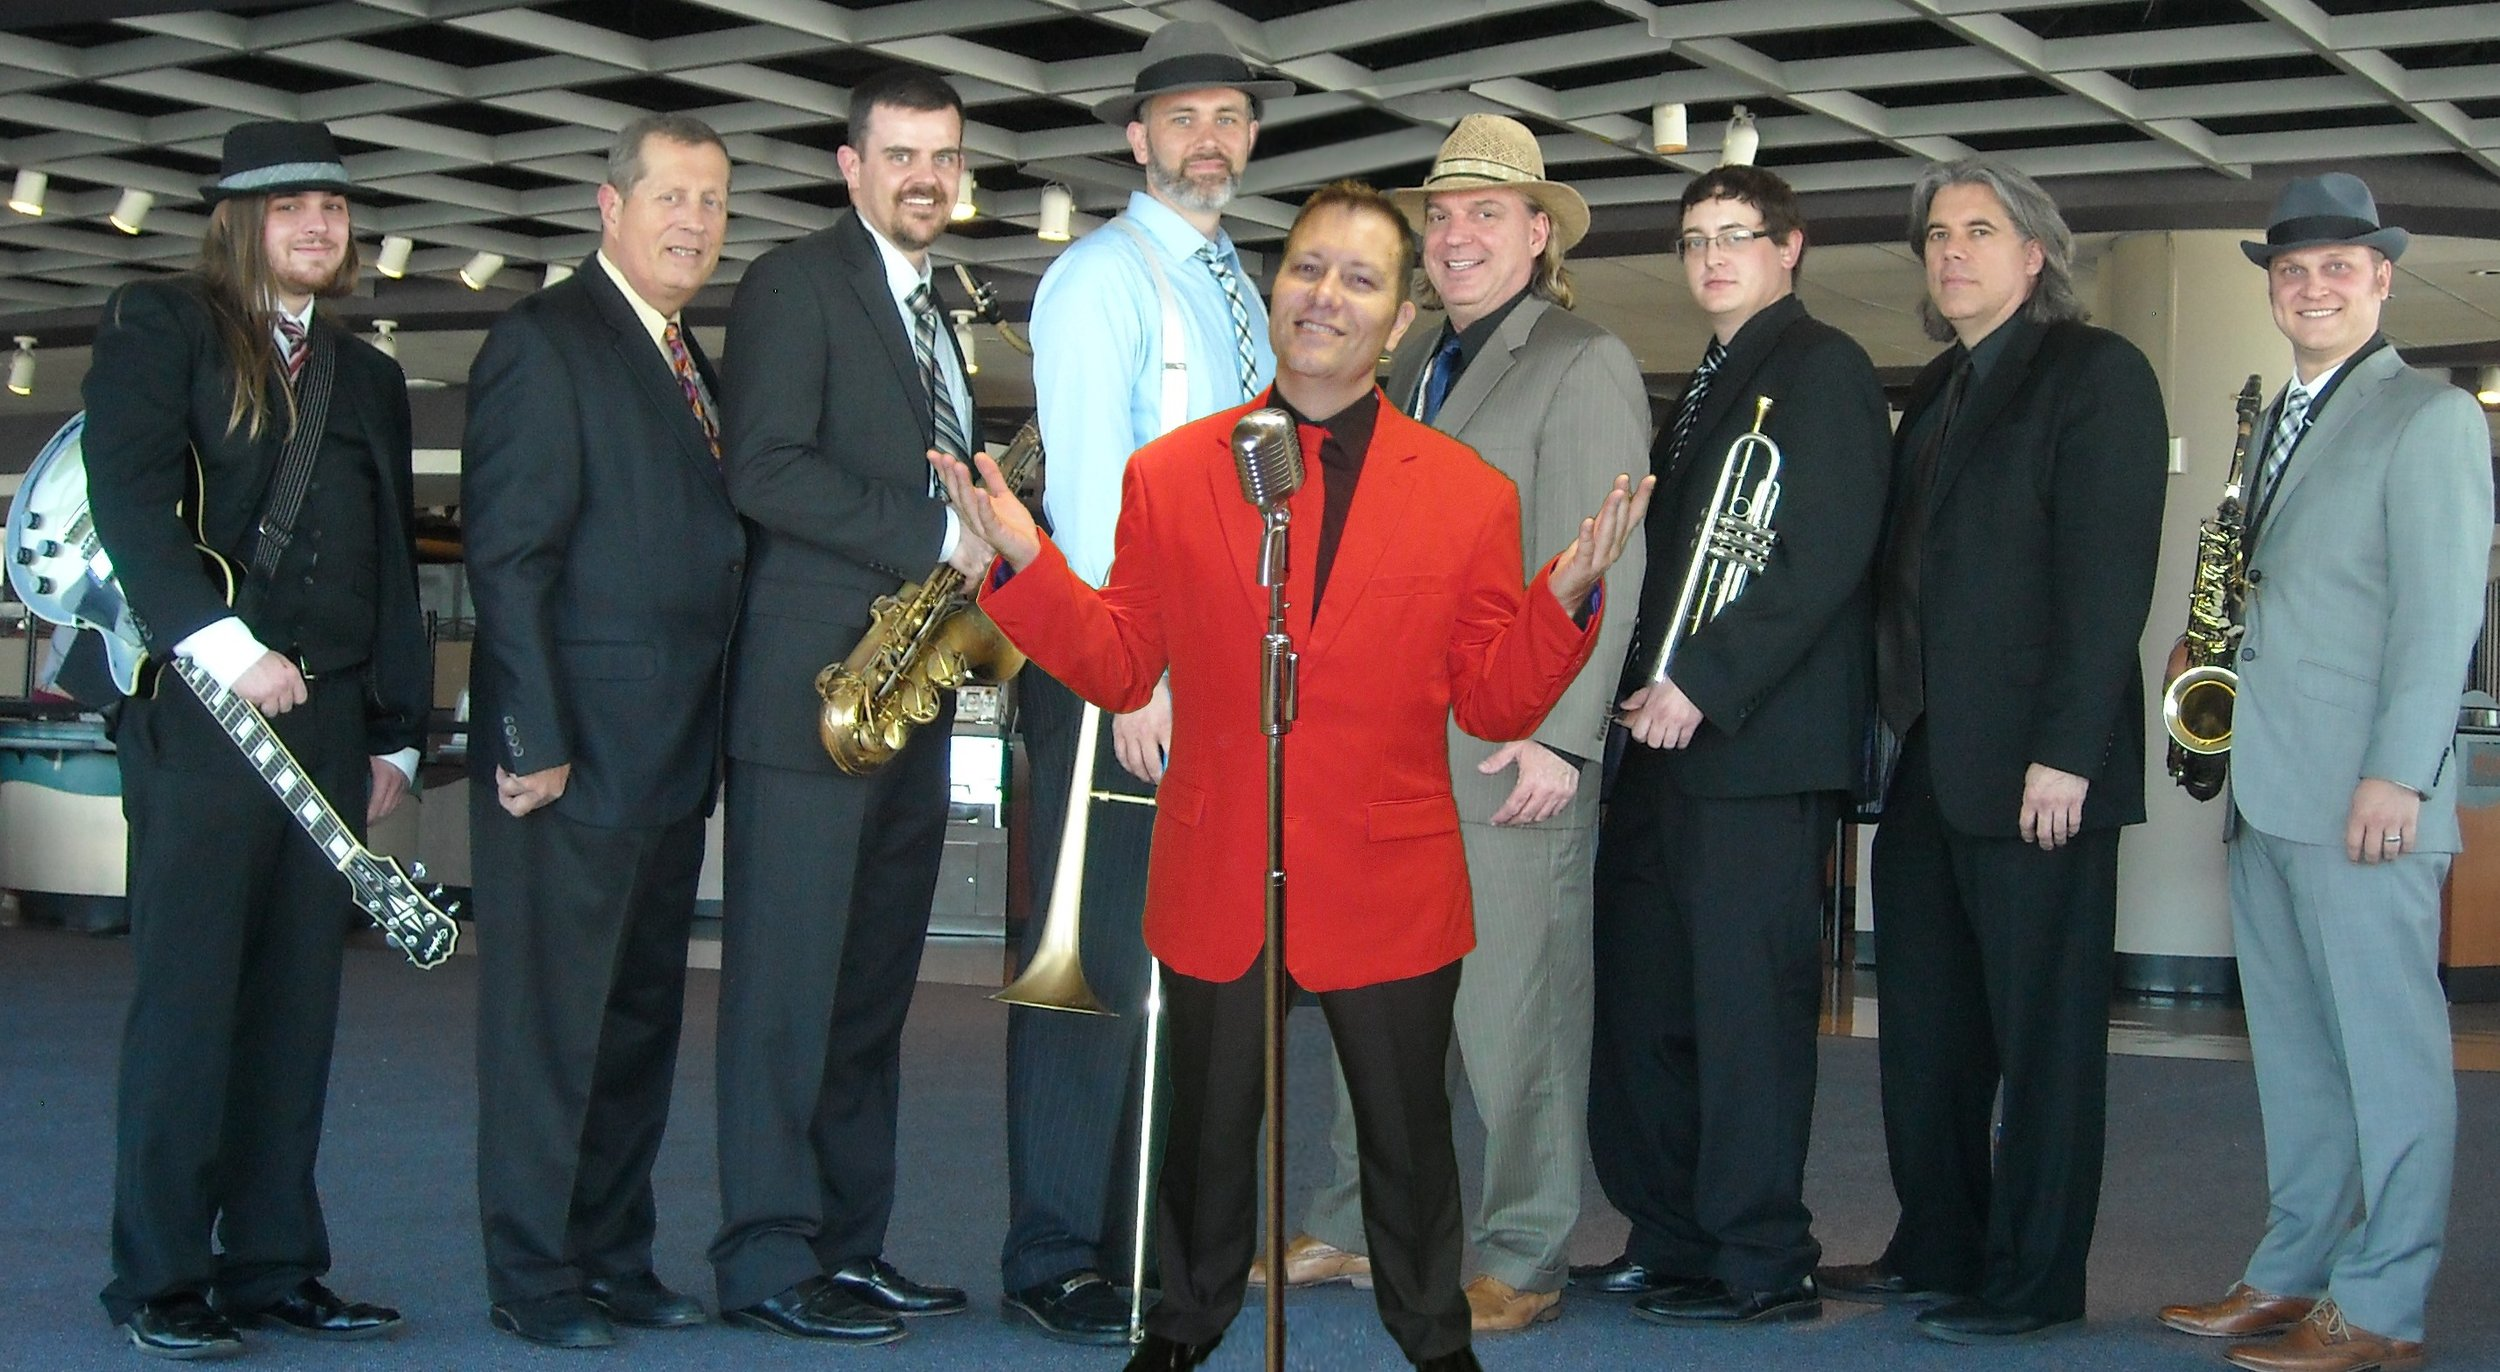 MAD MEN SWING BAND (40s & 5os Lounge, Swing, Vocal Jazz)